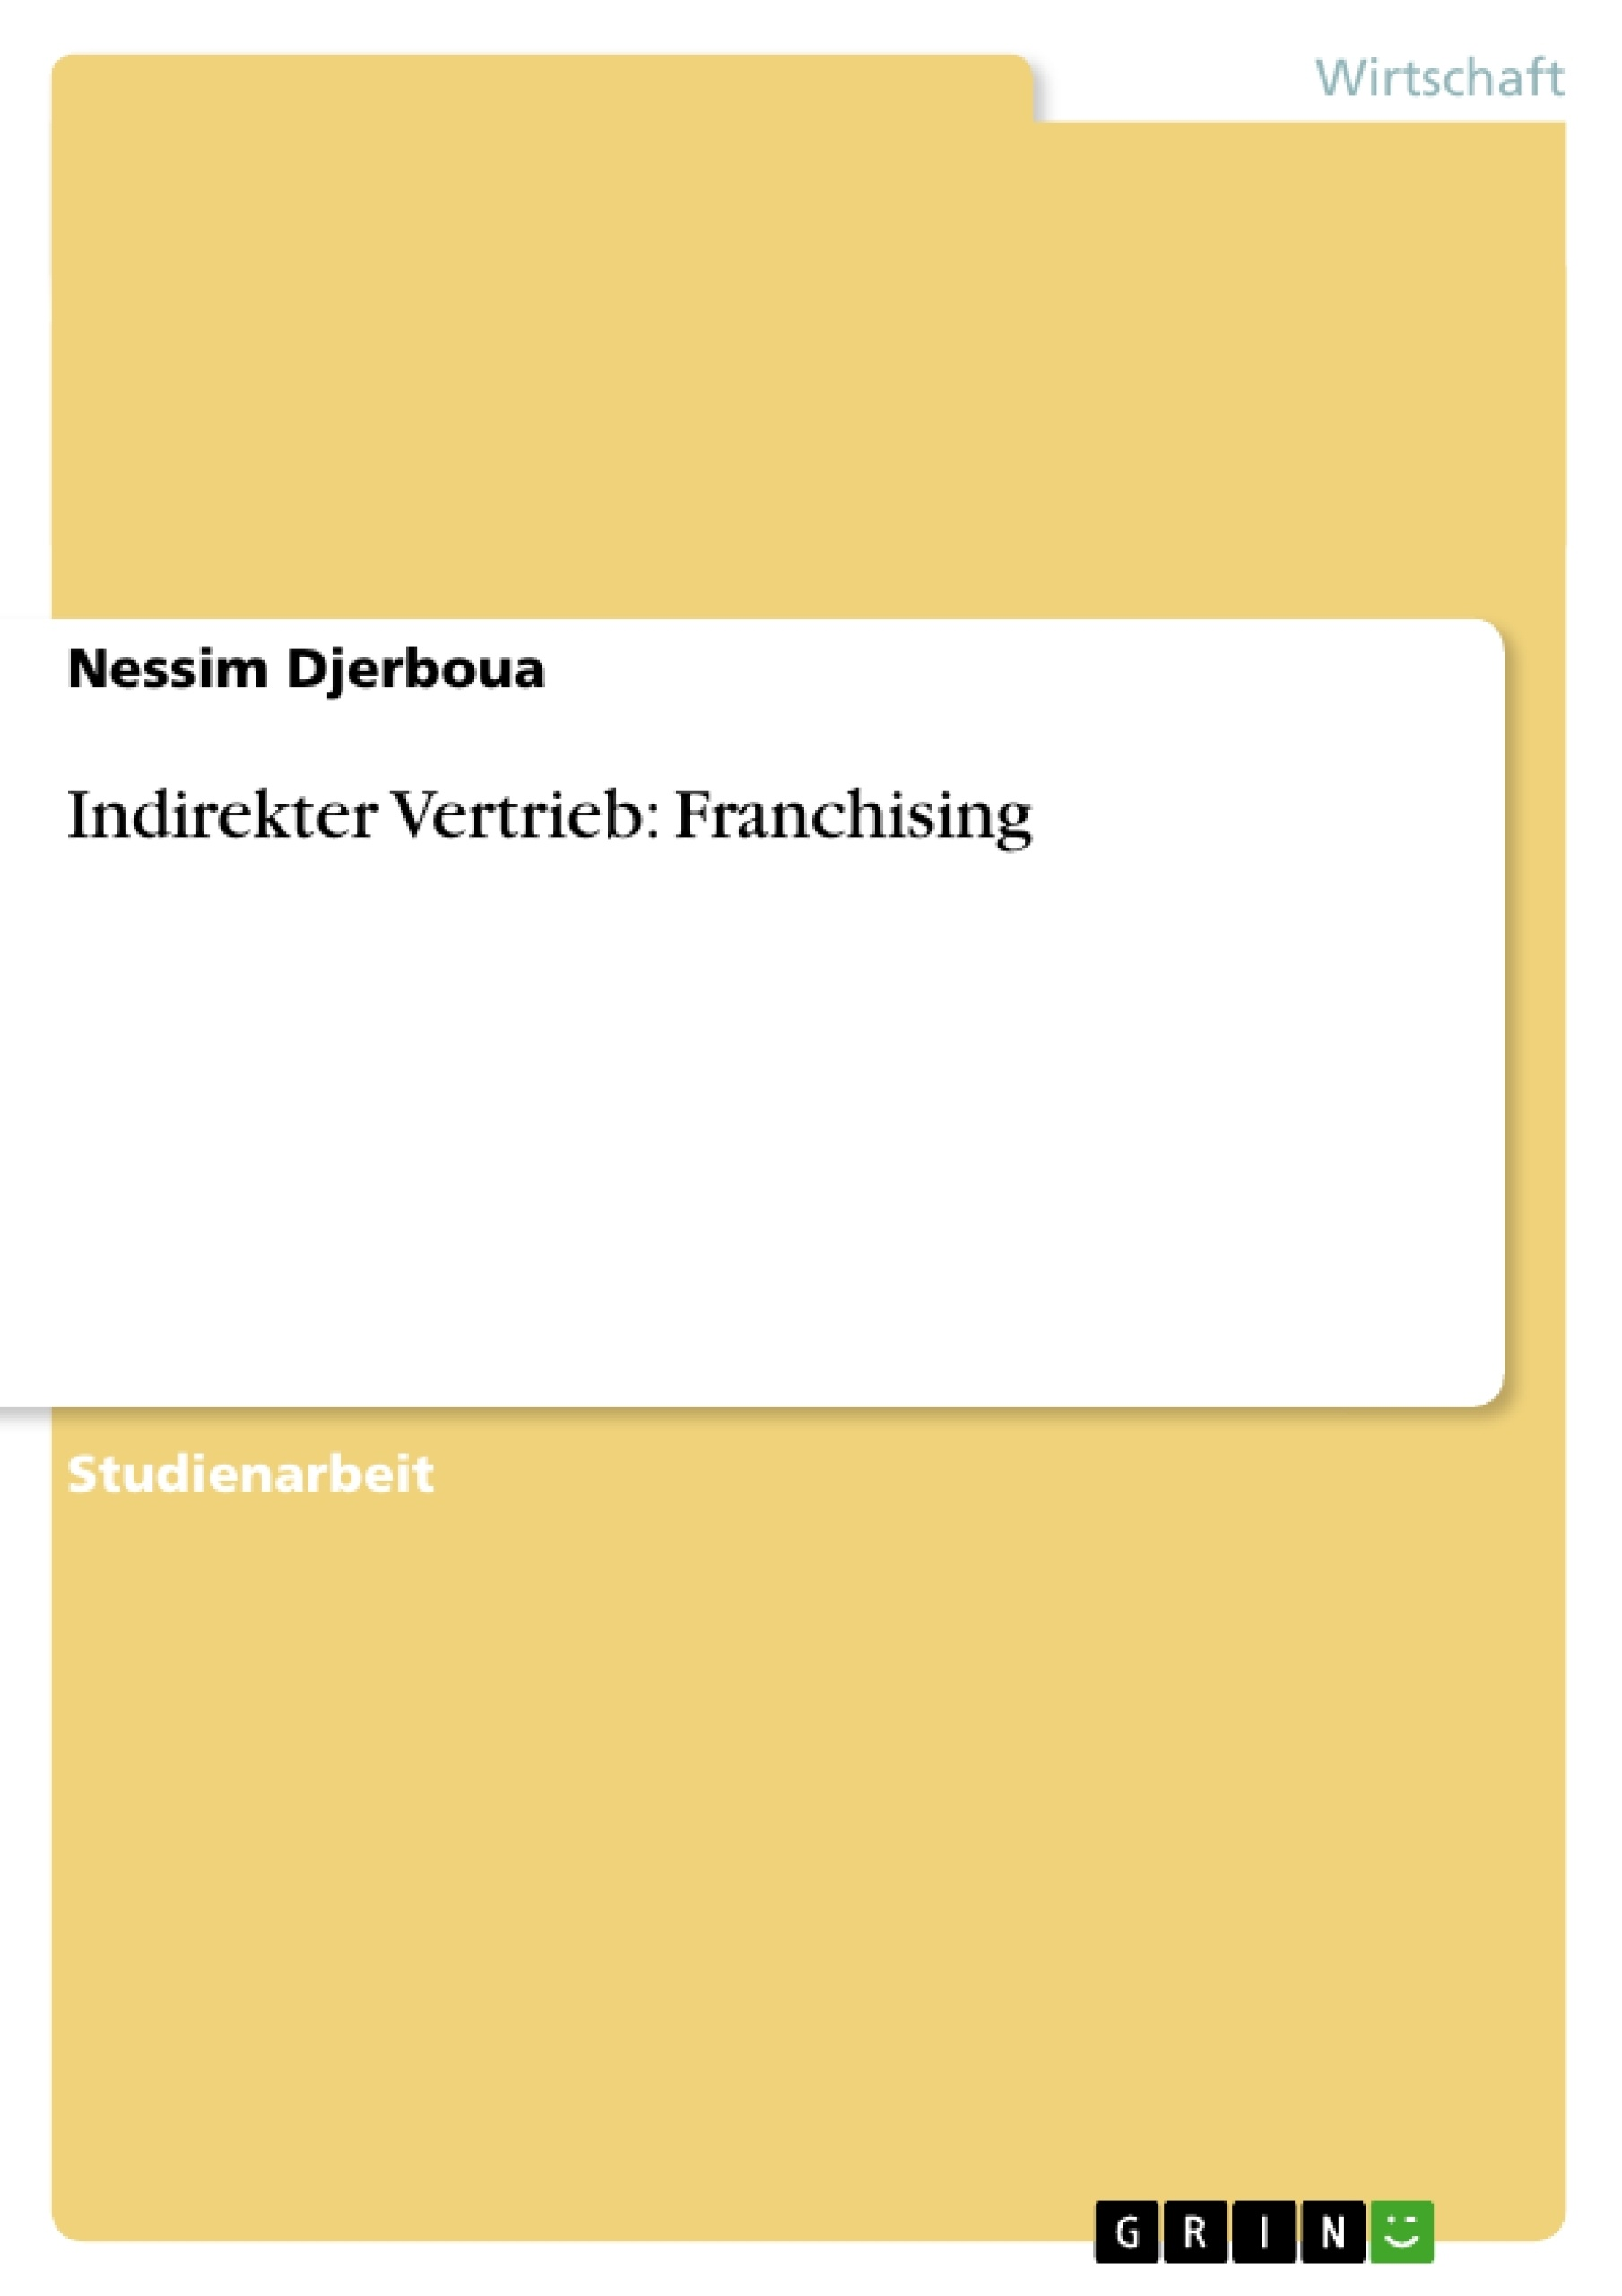 Titel: Indirekter Vertrieb: Franchising